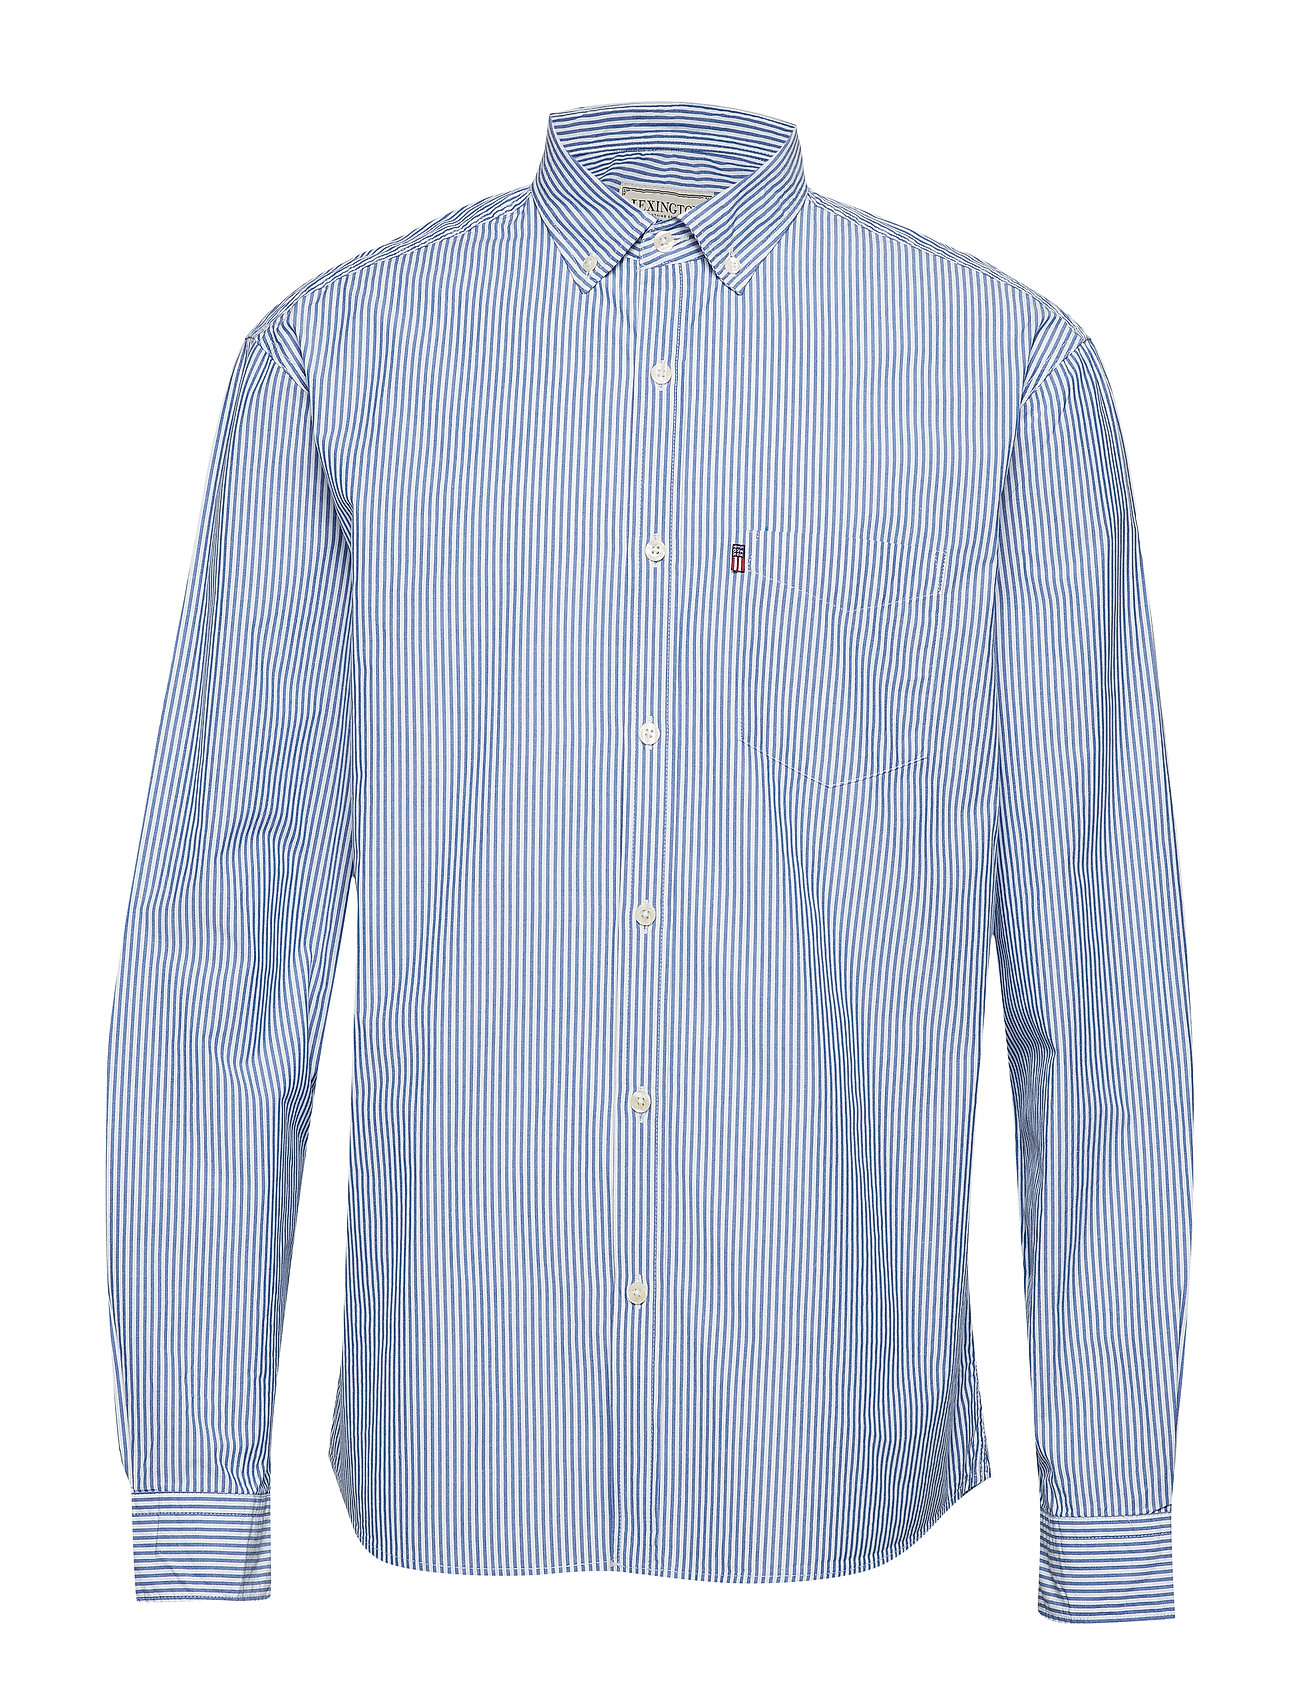 Lexington Clothing Taylor Poplin Shirt - BLUE/WHITE STRIPE